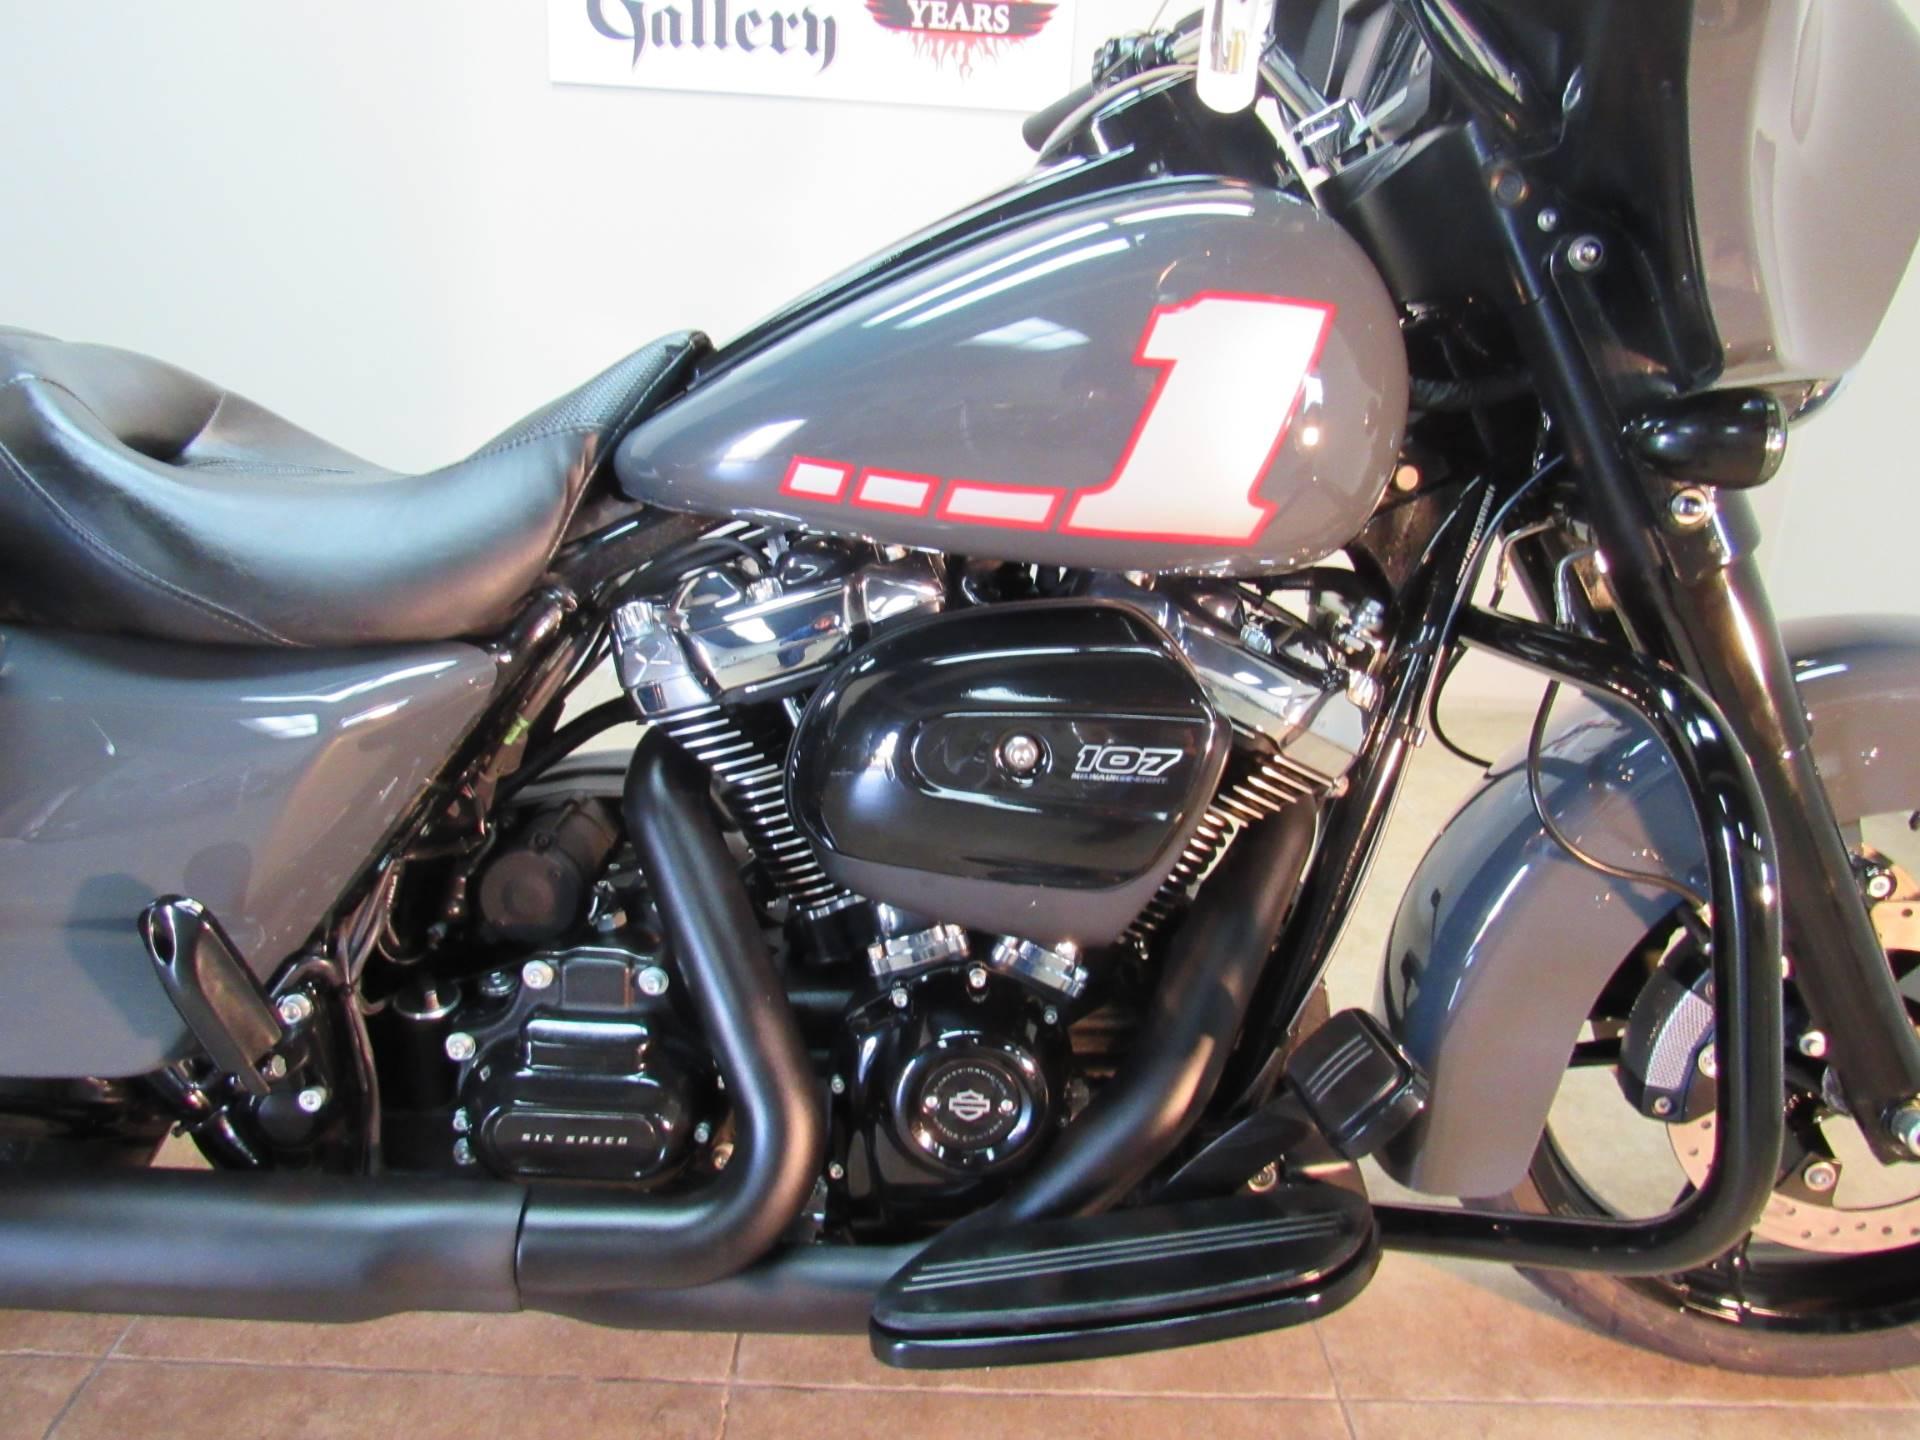 2018 Harley-Davidson Street Glide Special 10